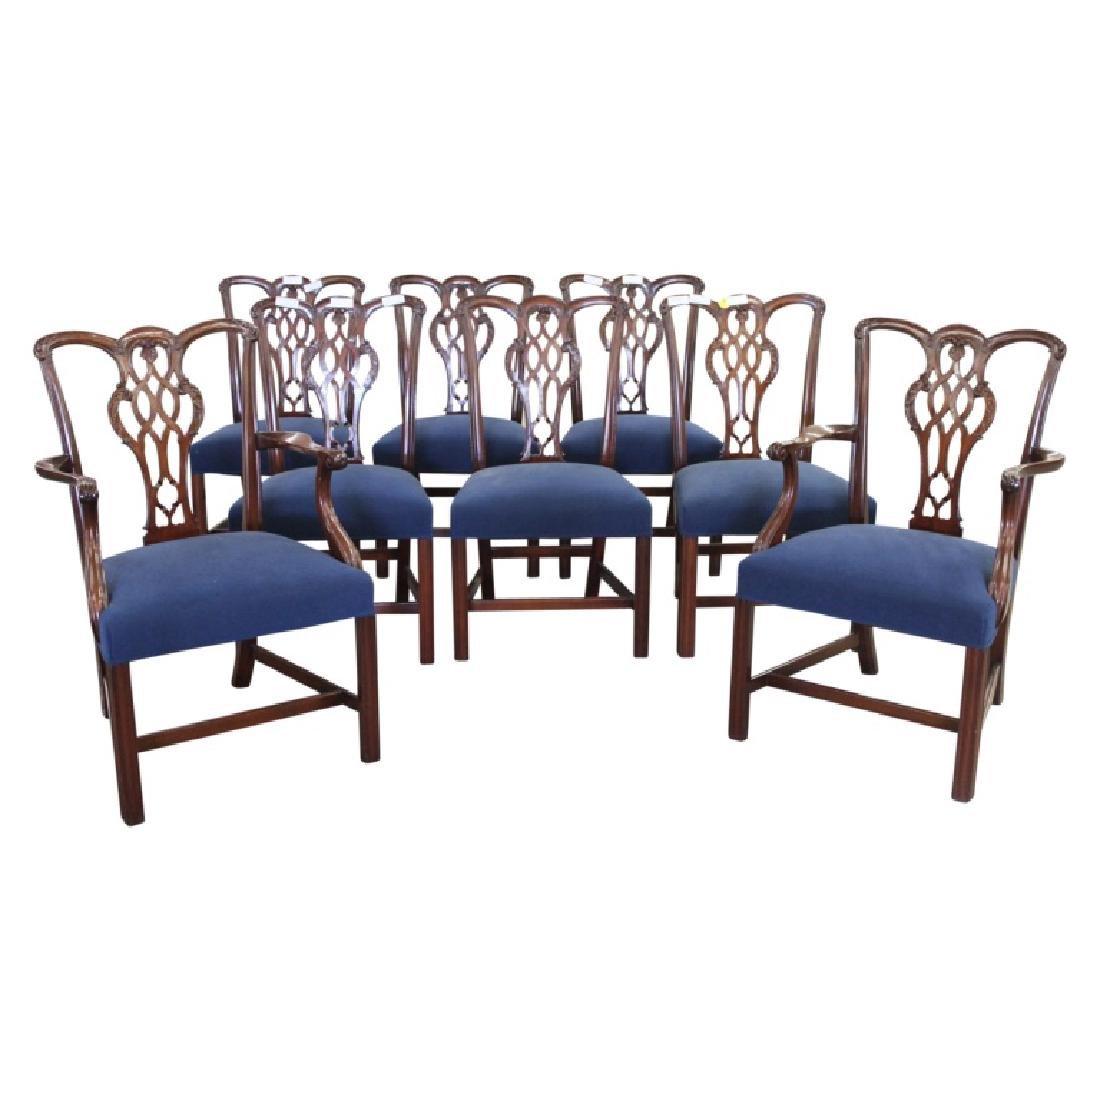 Schmieg & Kotztan Dining Chairs - 8 PCS